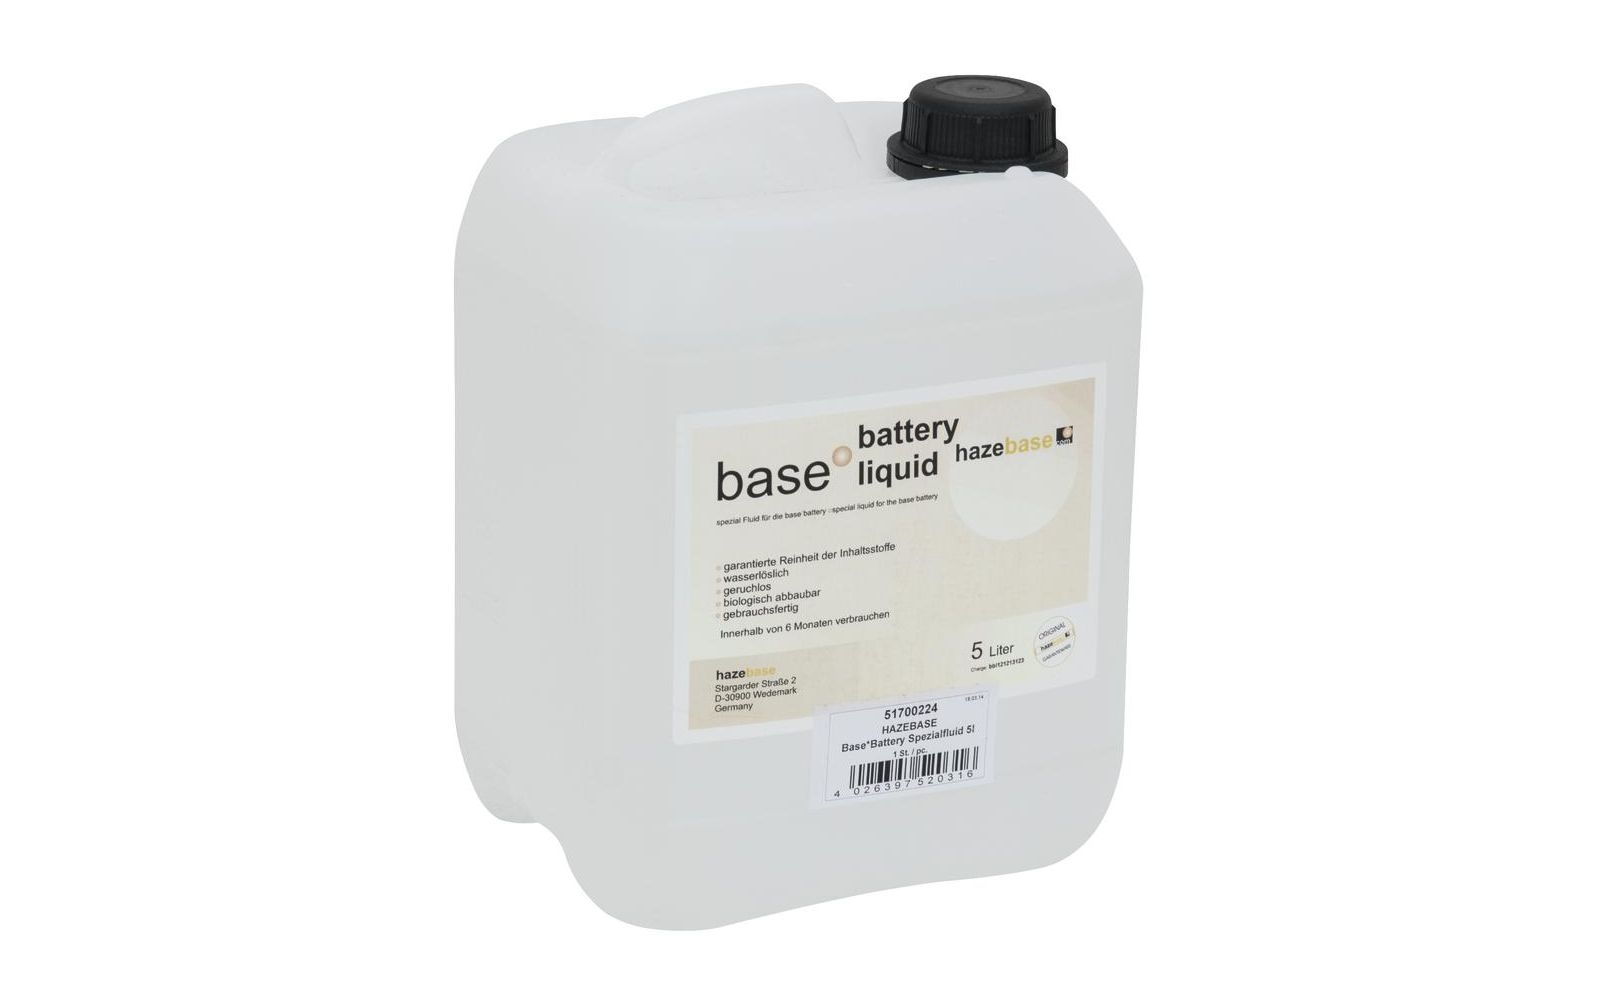 hazebase-base-battery-spezialfluid-25l-kanister